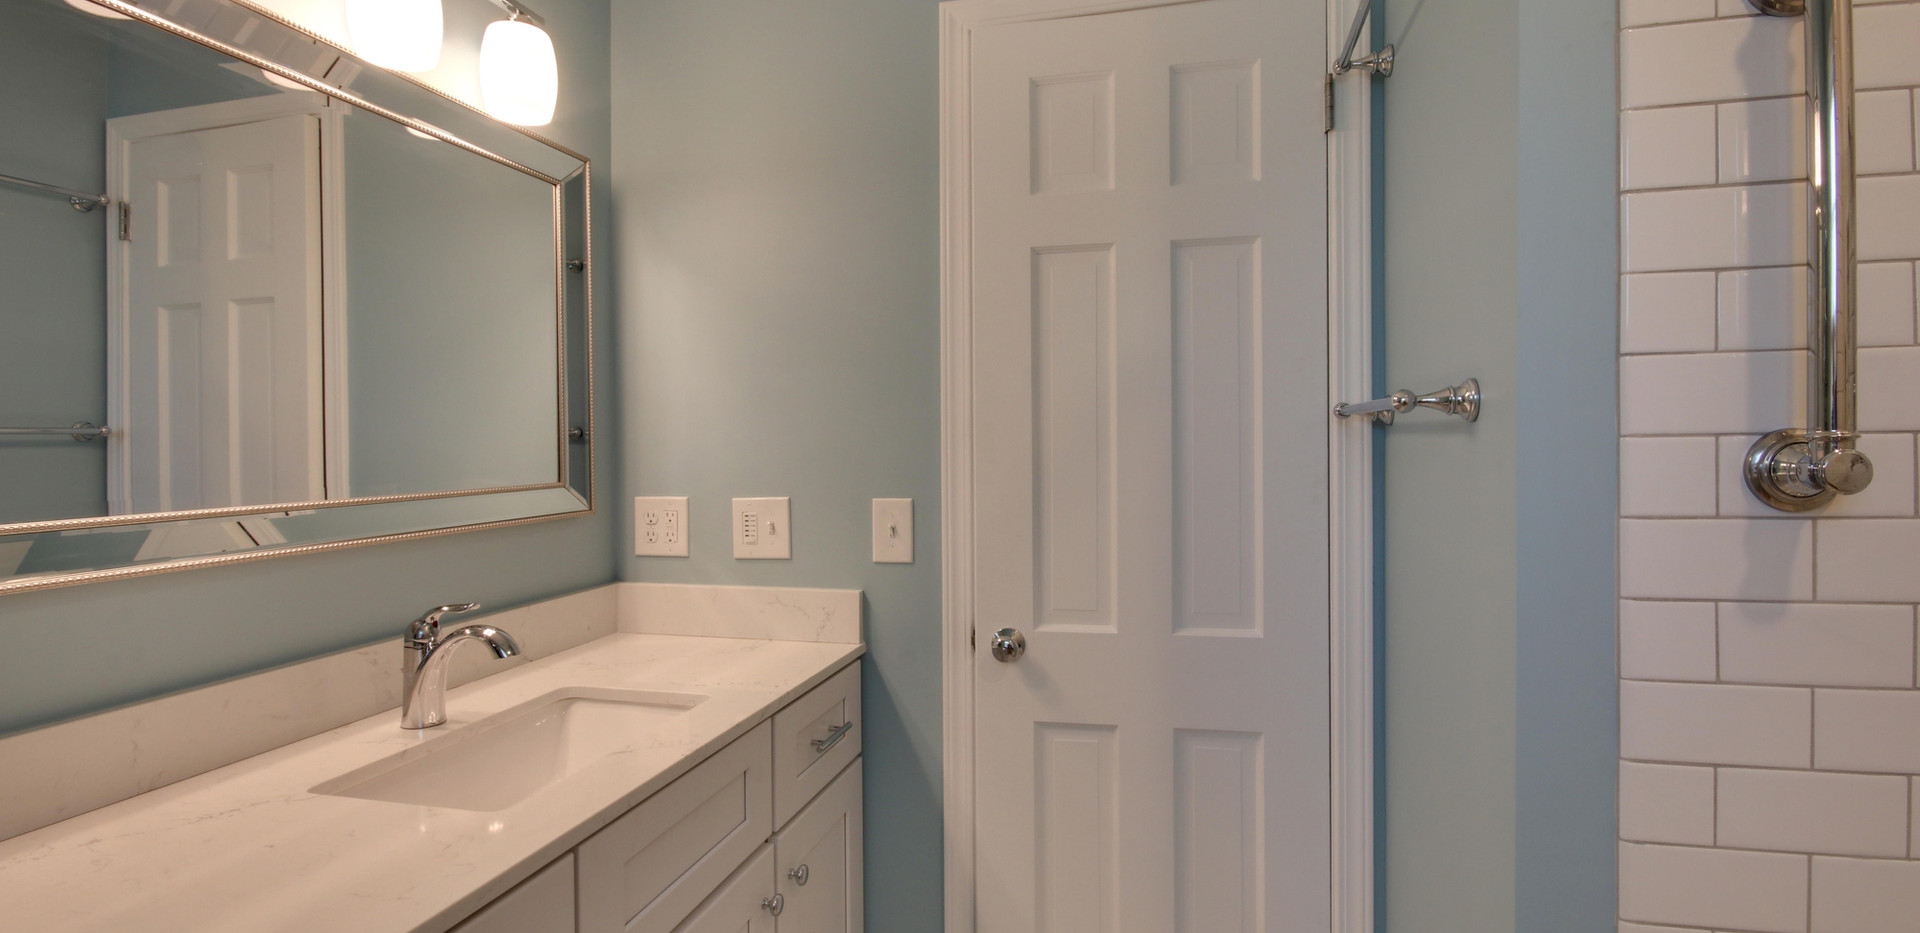 Bathroom vanity side view of Hudsonville remodel project